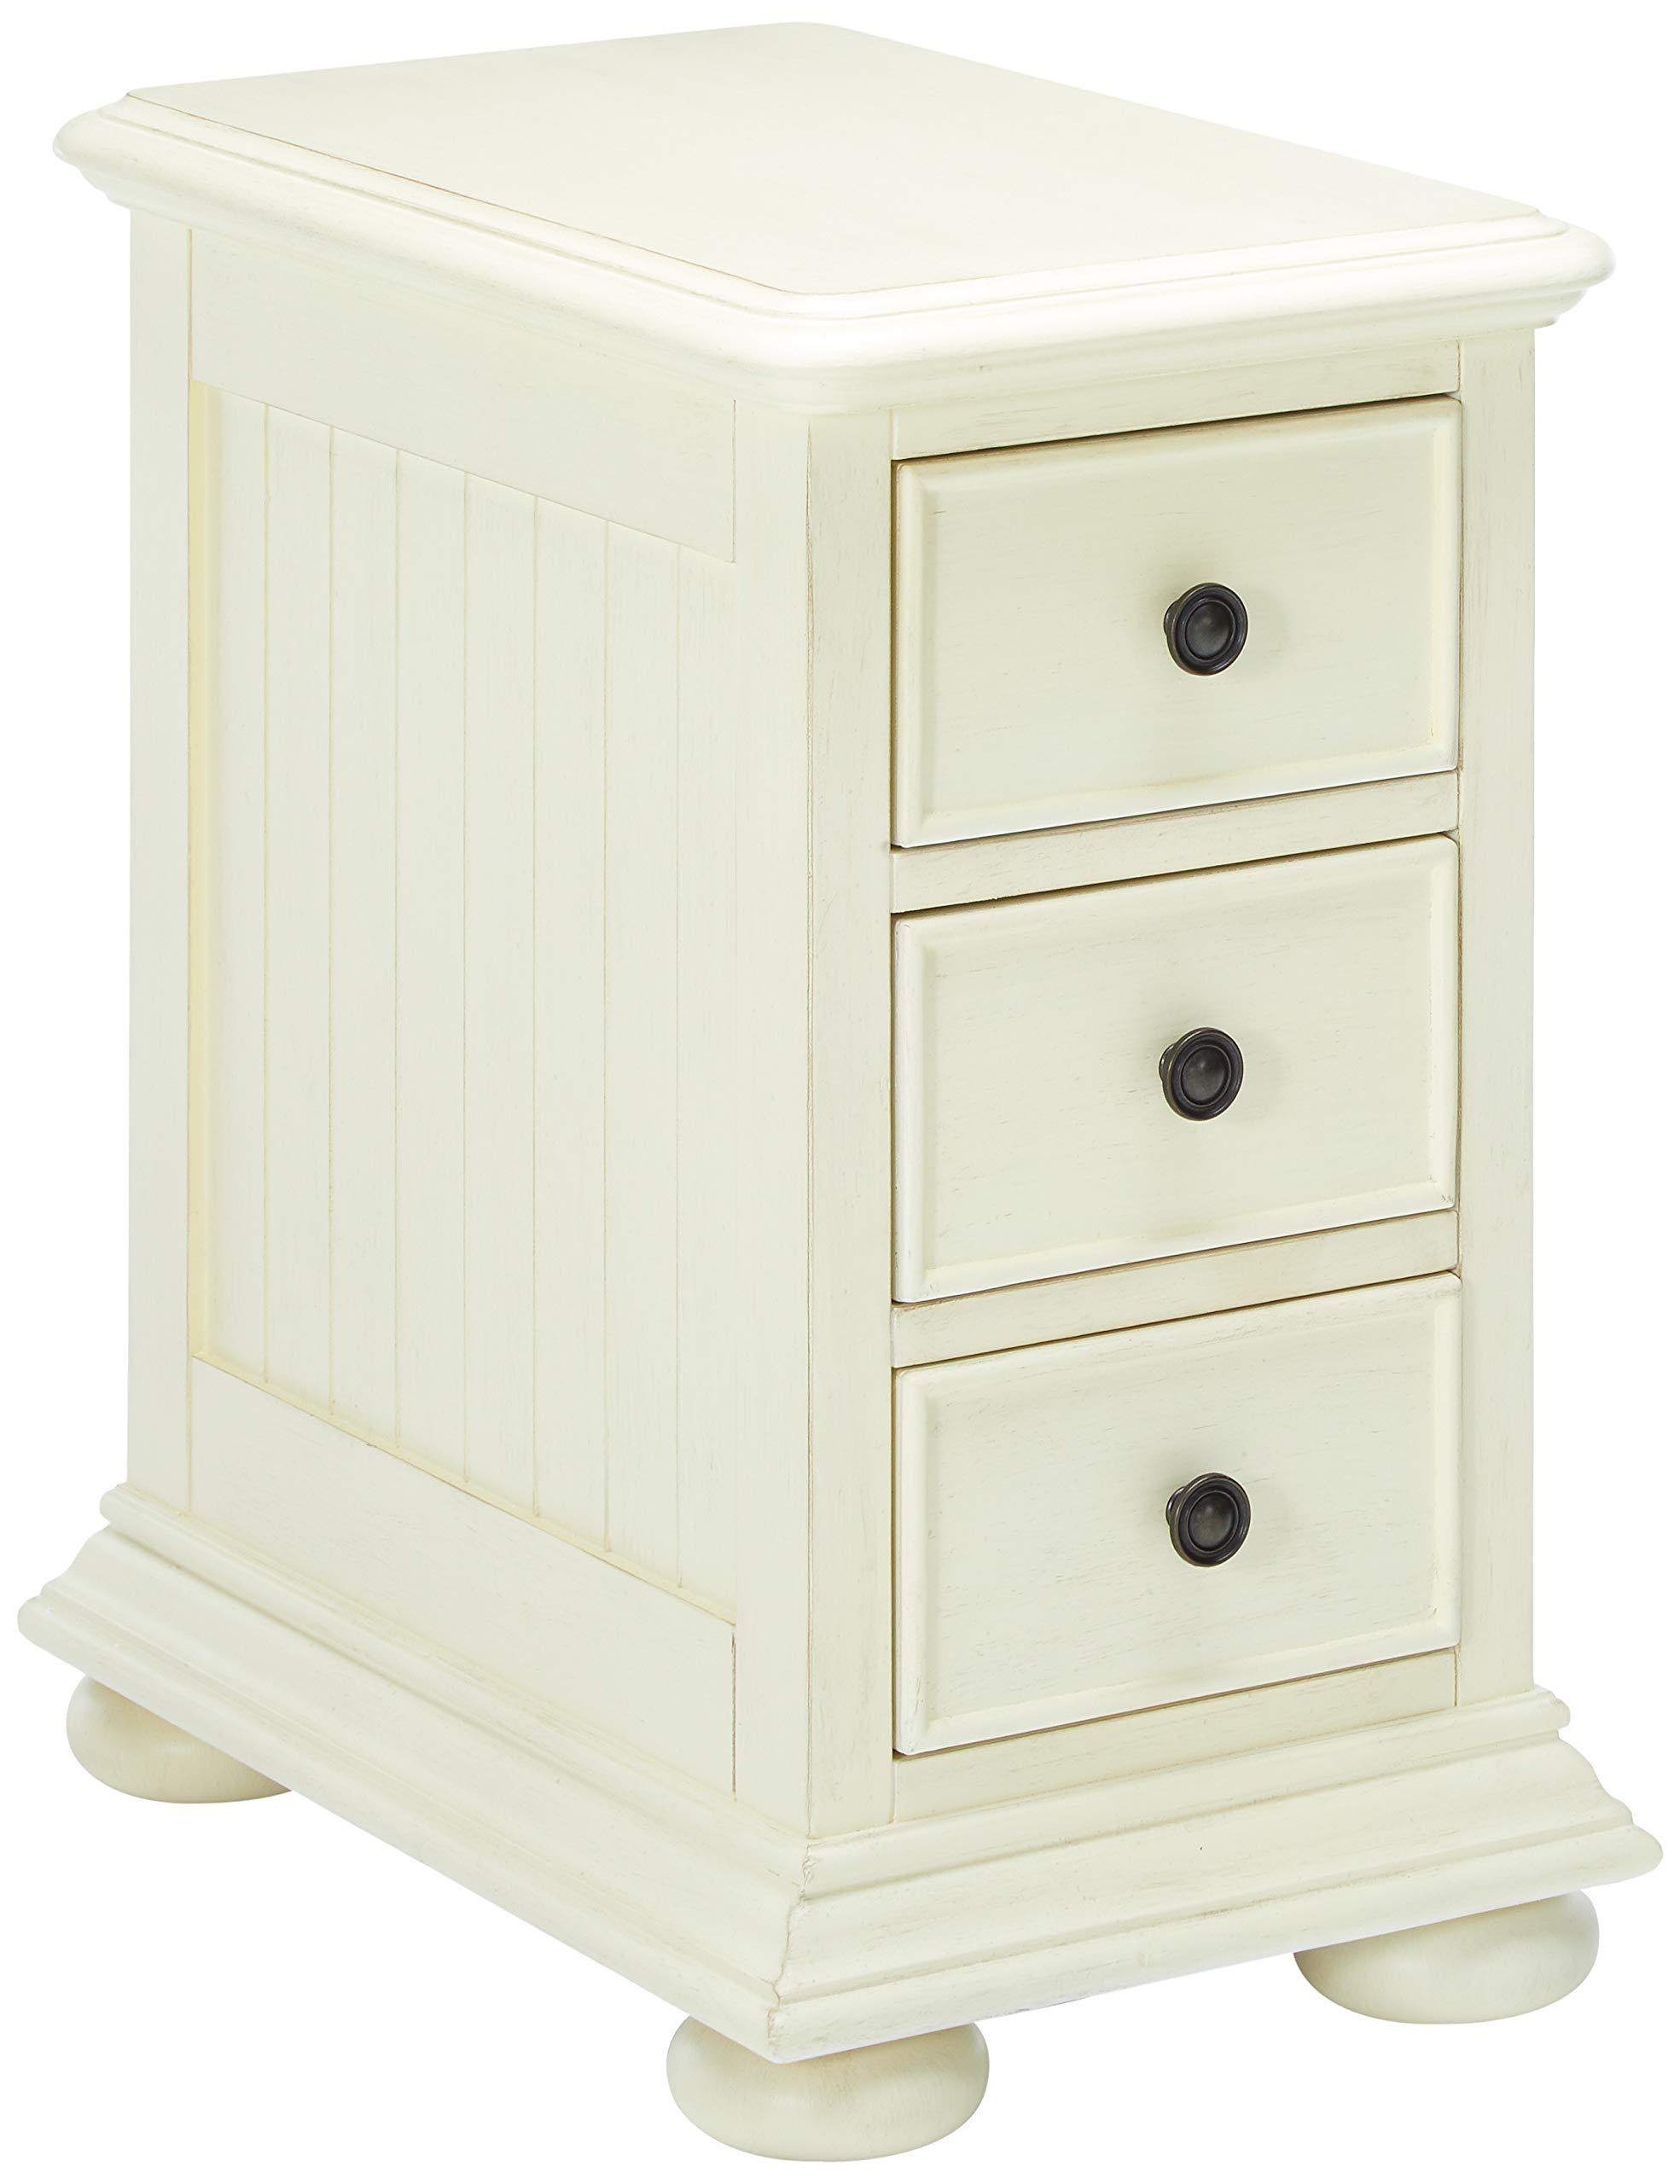 Pulaski  Coastal Chairside White Accent Chest Cabinet by Pulaski